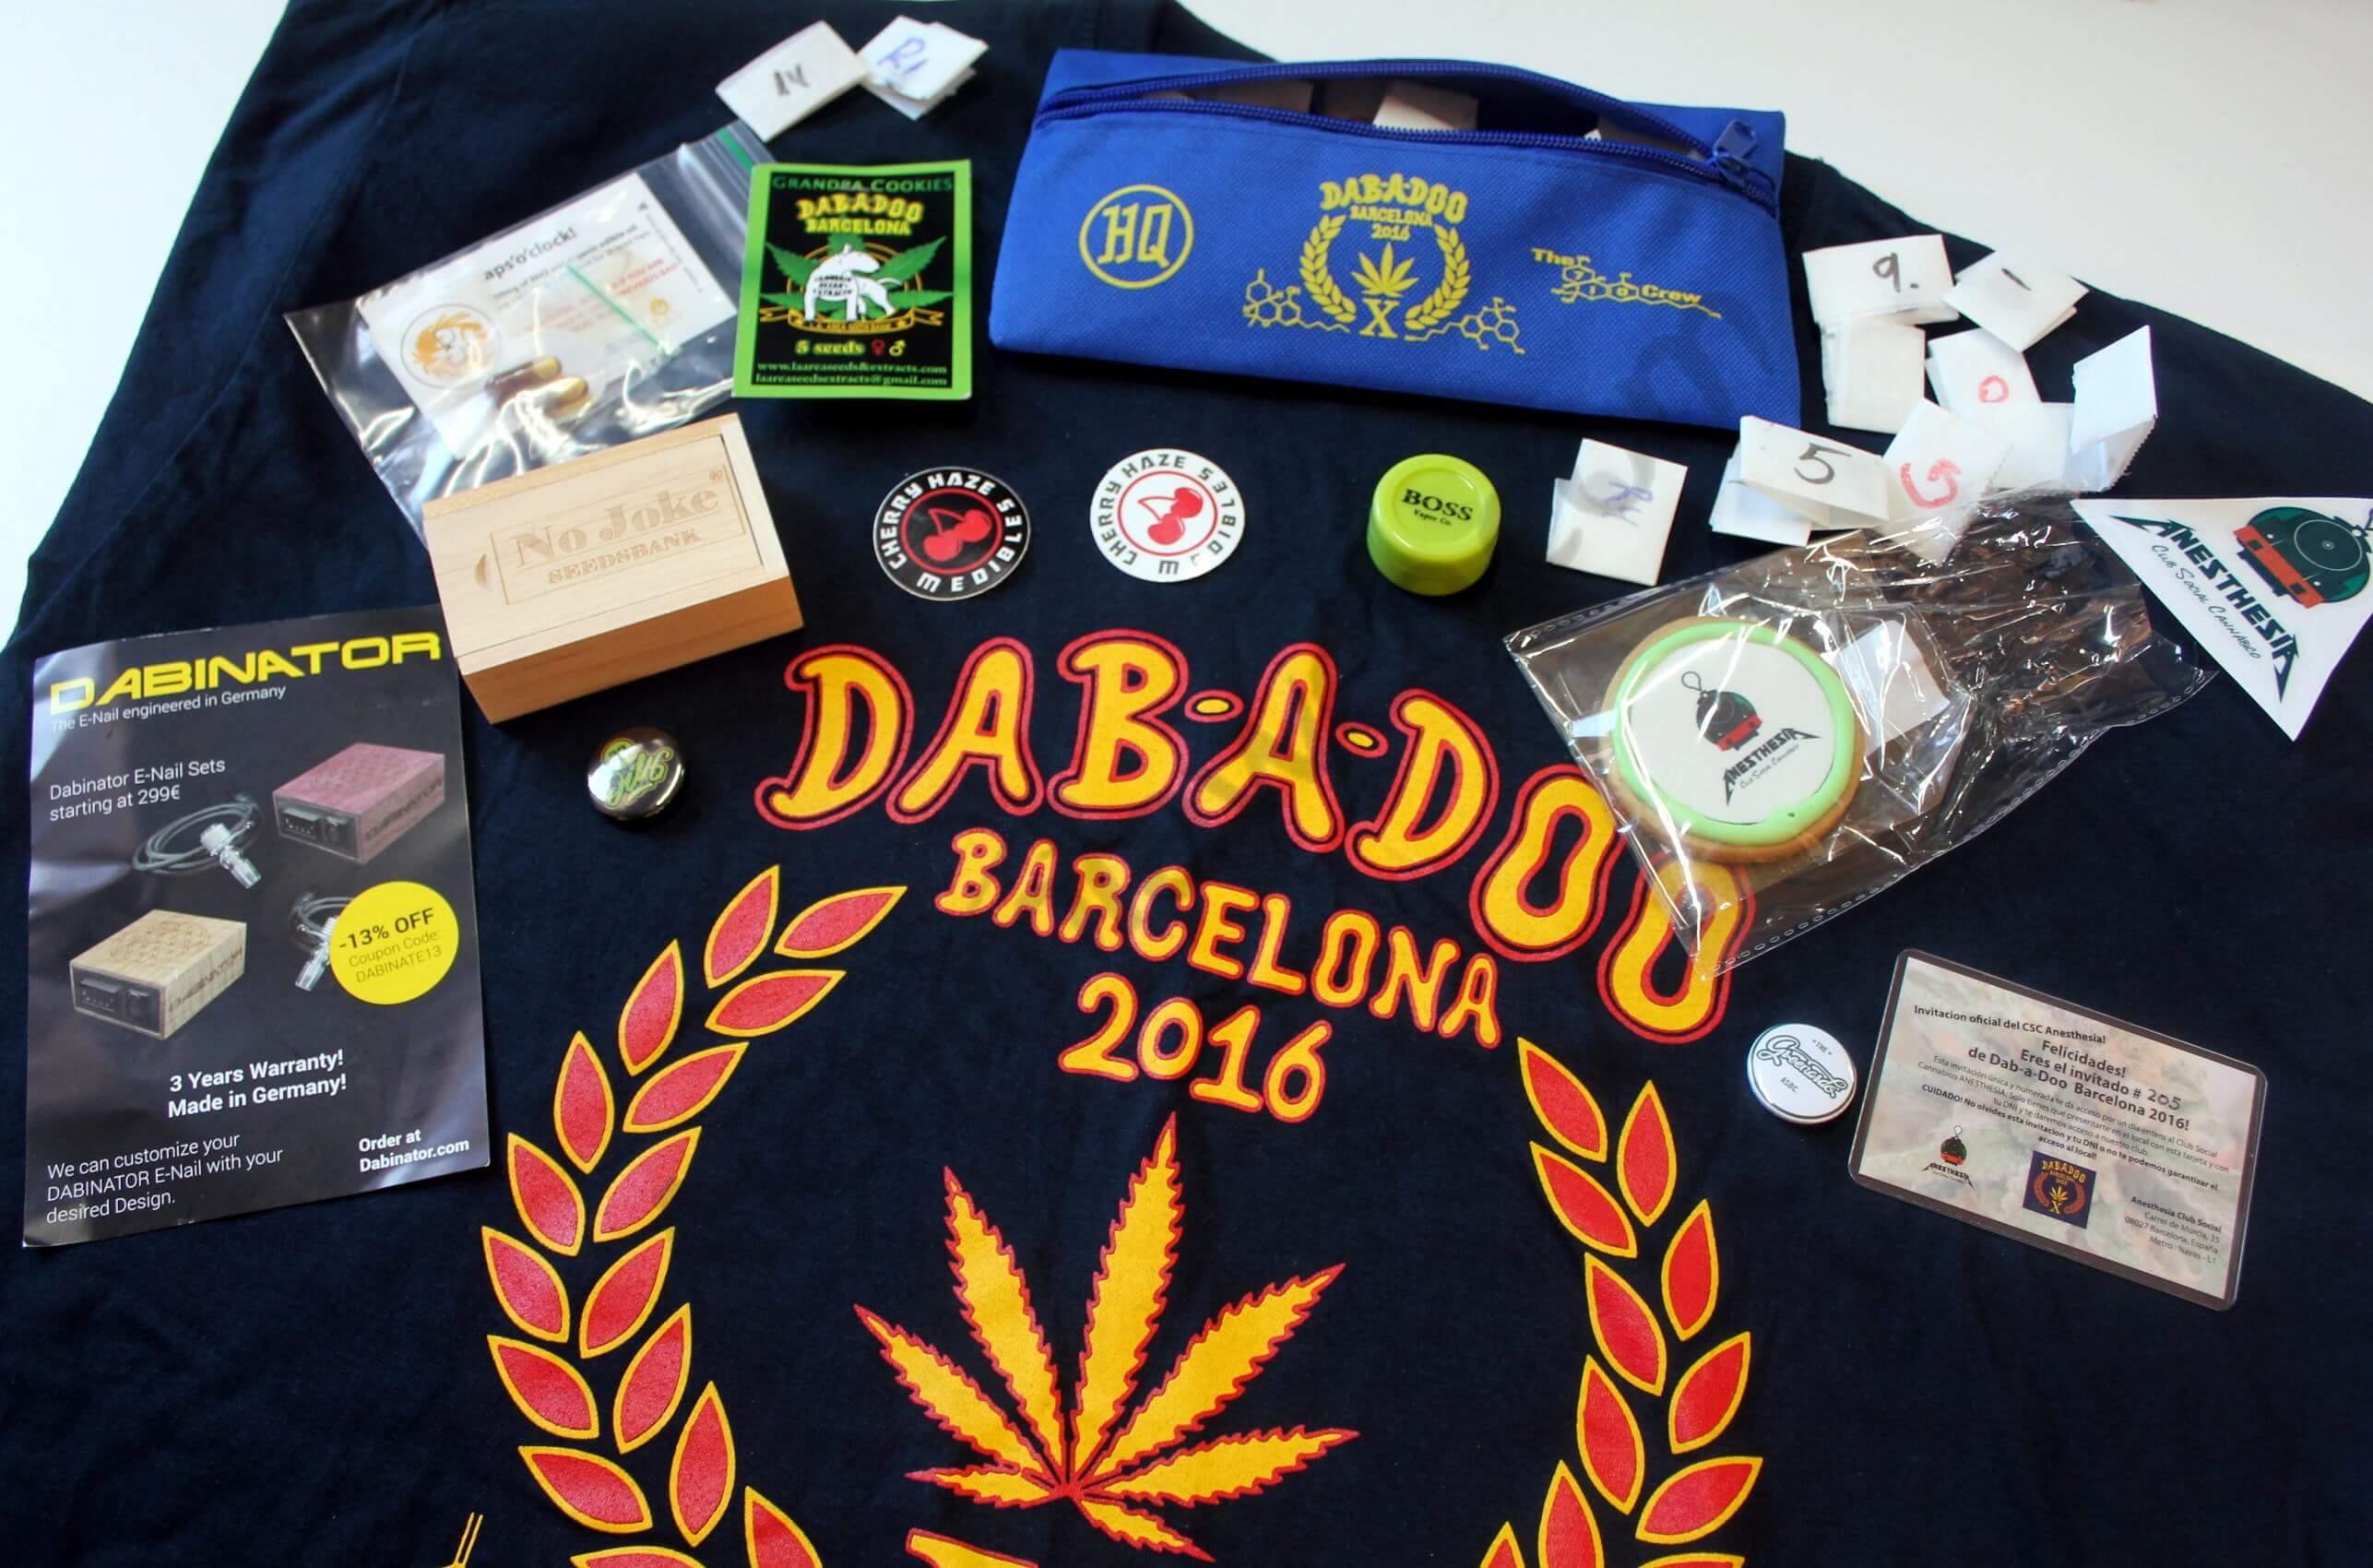 Dab a Doo Barcelona 2016